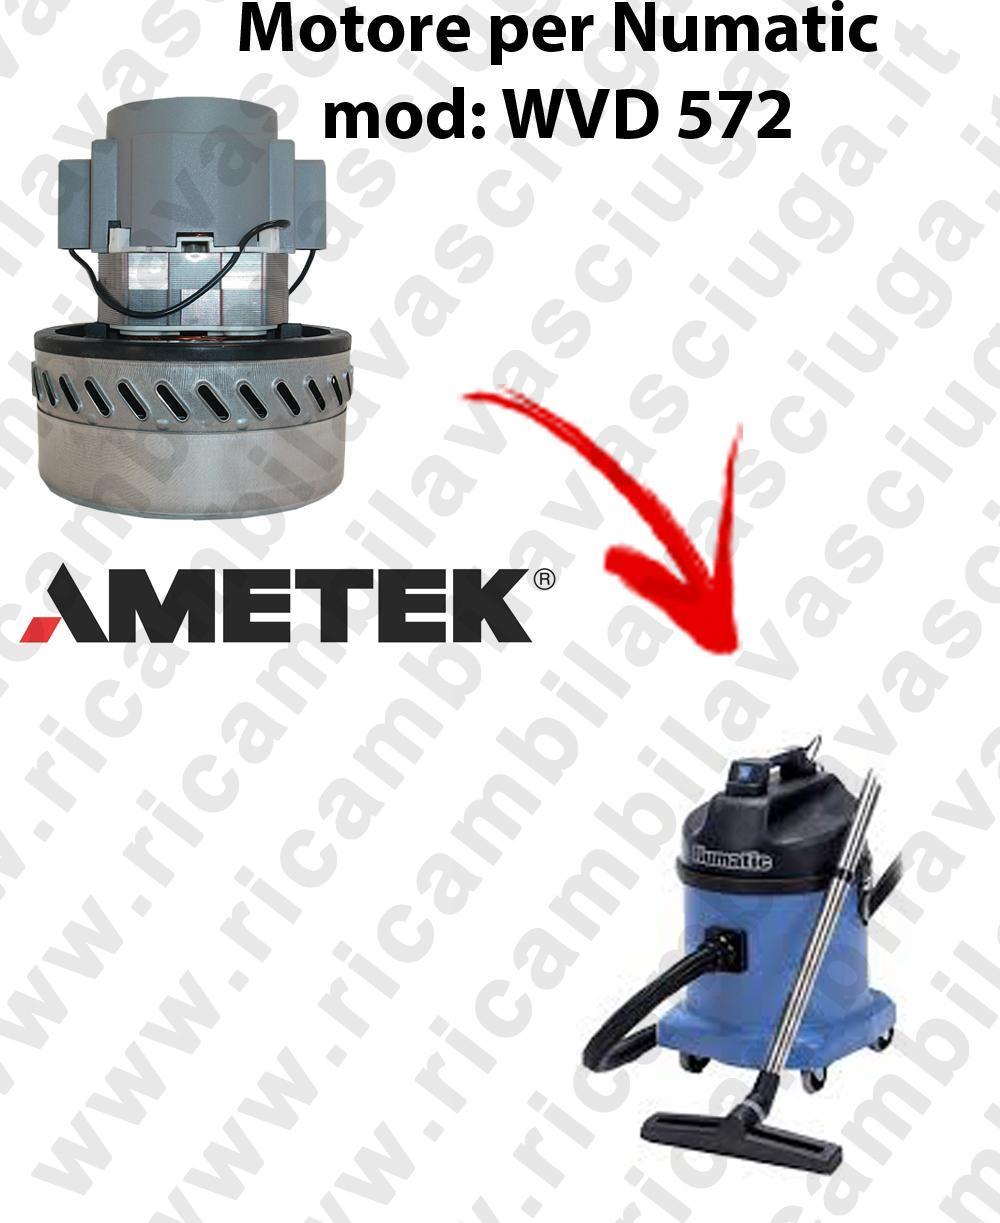 WVD 572 Saugmotor AMETEK für Staubsauger NUMATIC